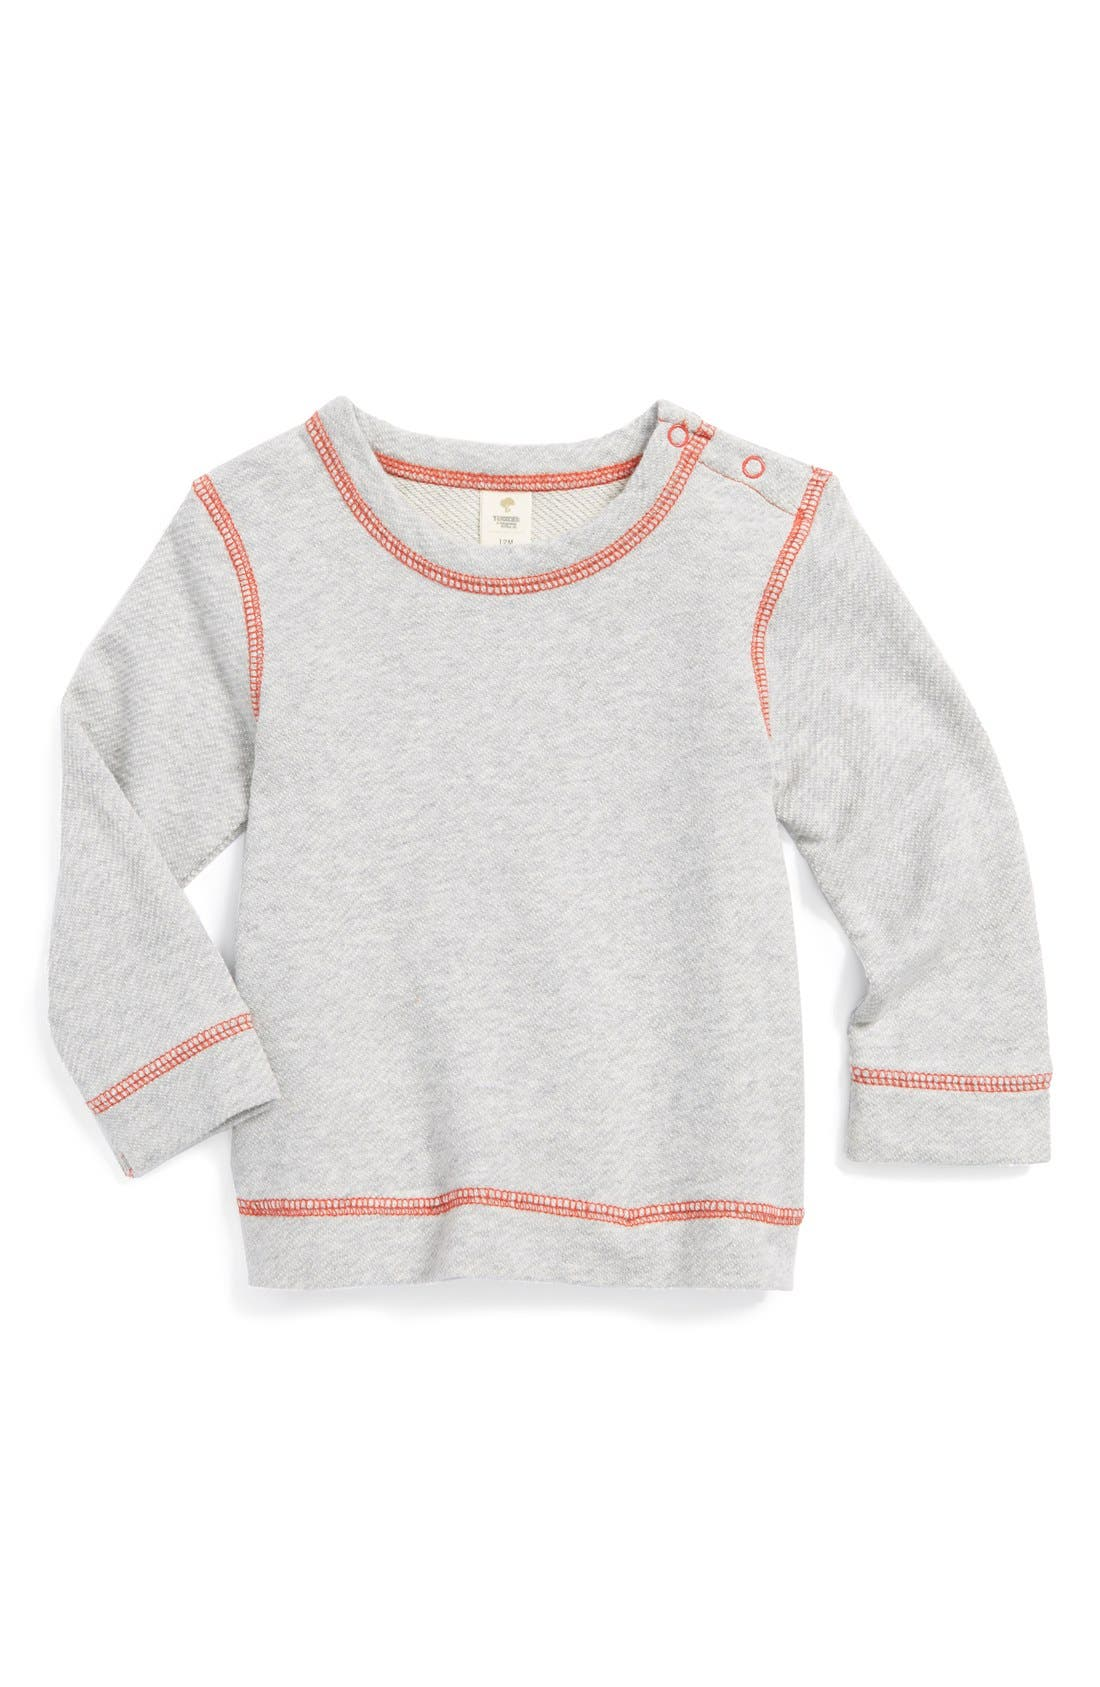 Main Image - Tucker + Tate Cotton Sweatshirt (Baby Boys)